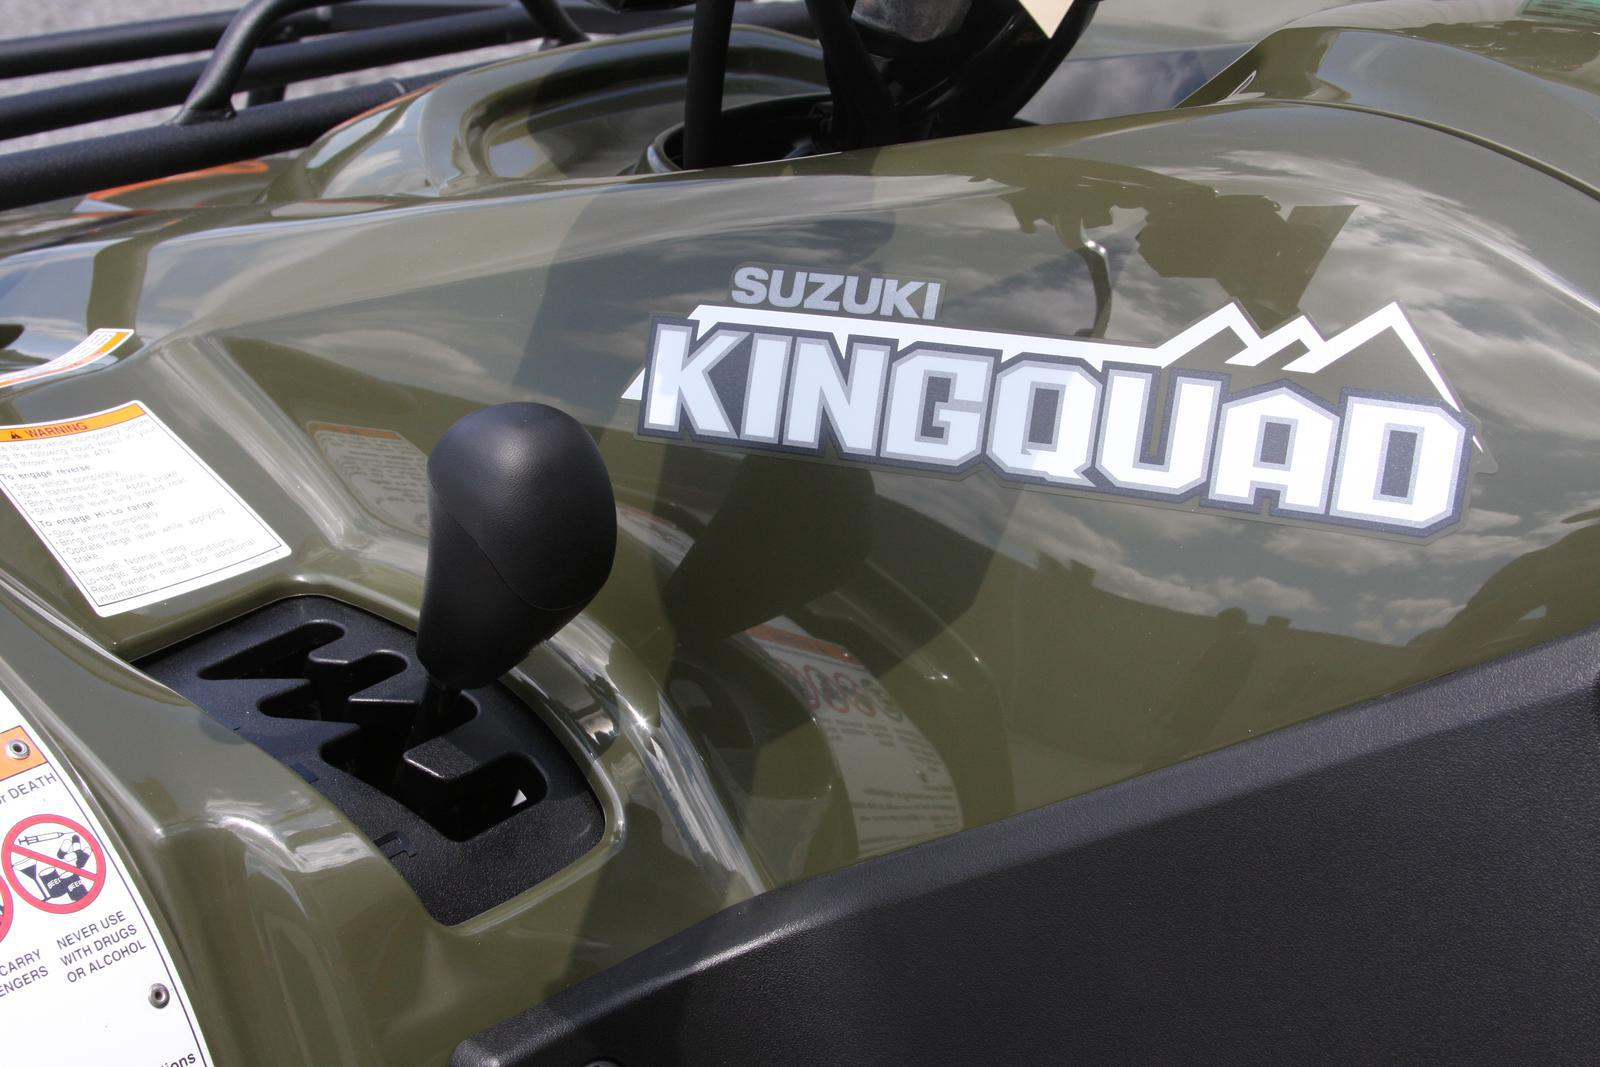 2018 suzuki kingquad 500.  Kingquad 1  6 And 2018 Suzuki Kingquad 500